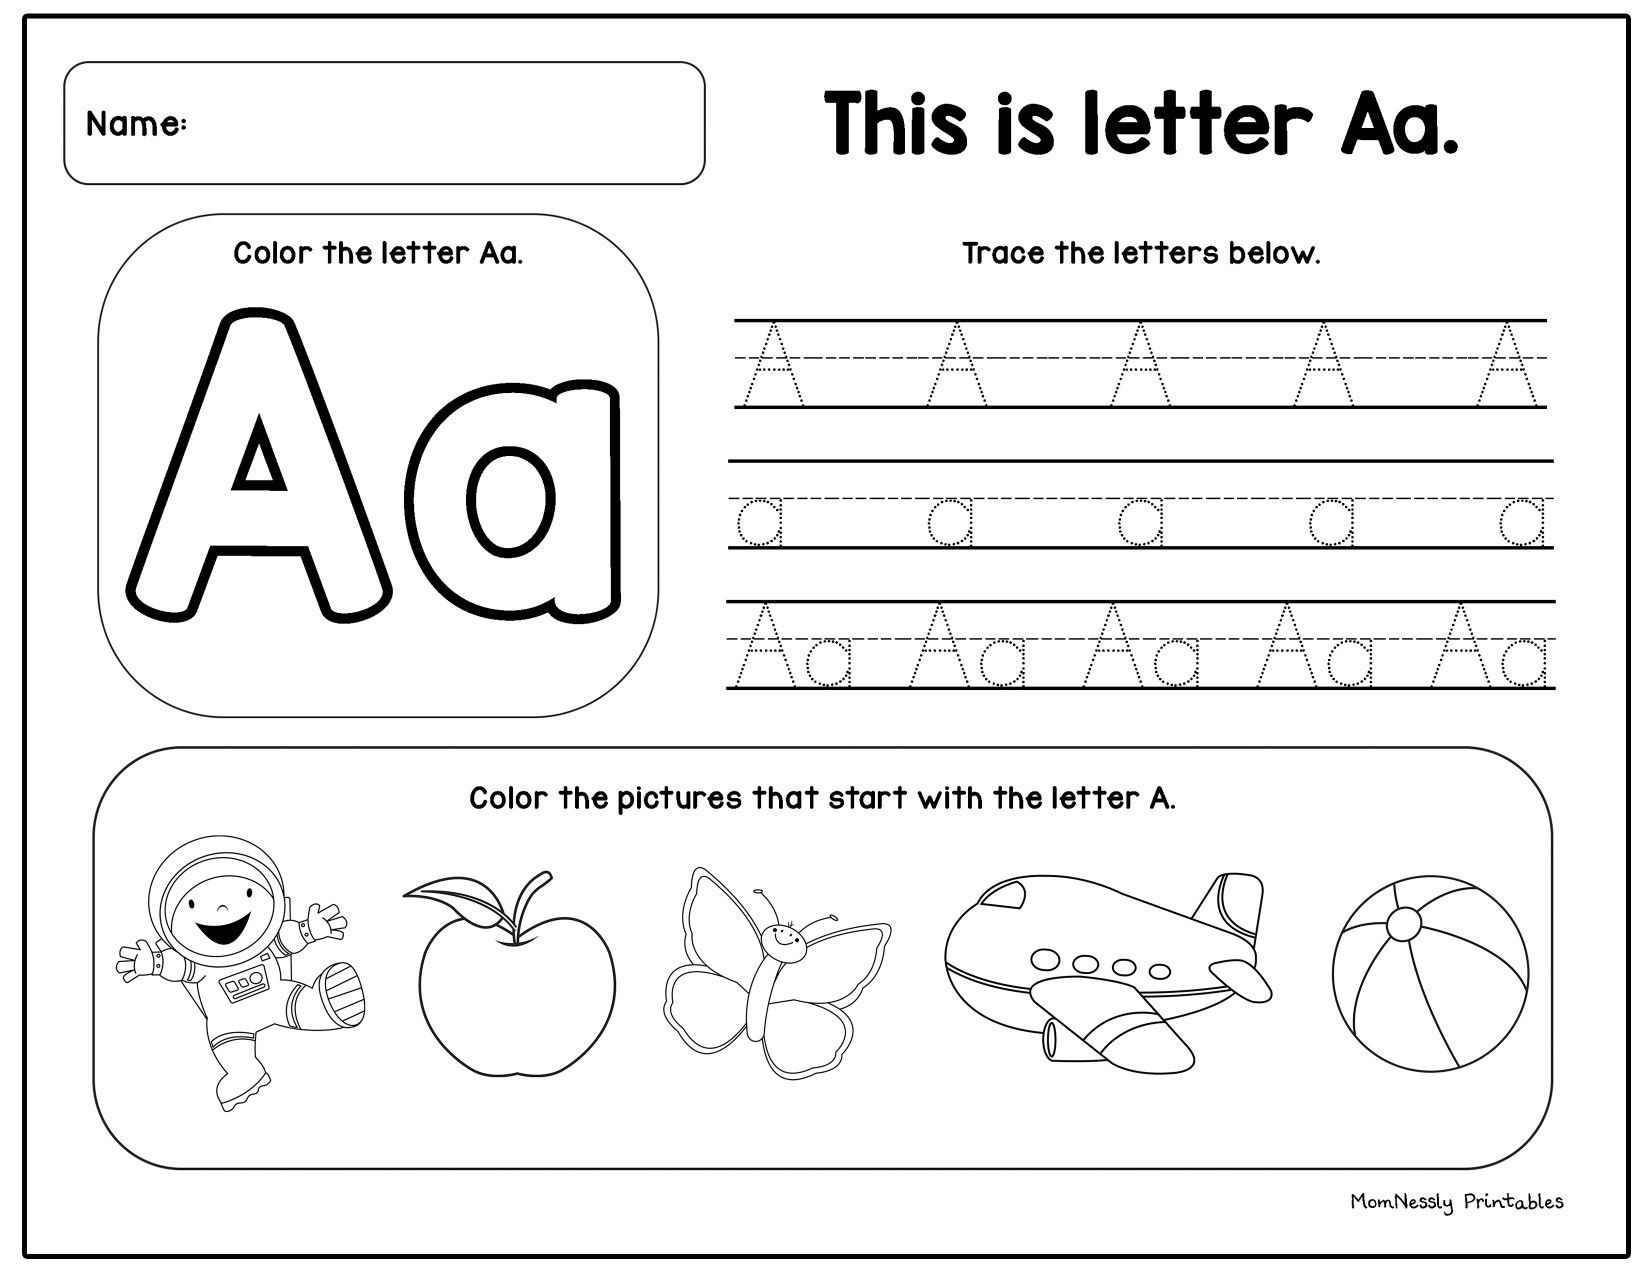 Alphabet Tracing Set Https Tribobot Com Alphabet Activities Preschool Alphabet Preschool Alphabet Tracing [ 1275 x 1650 Pixel ]